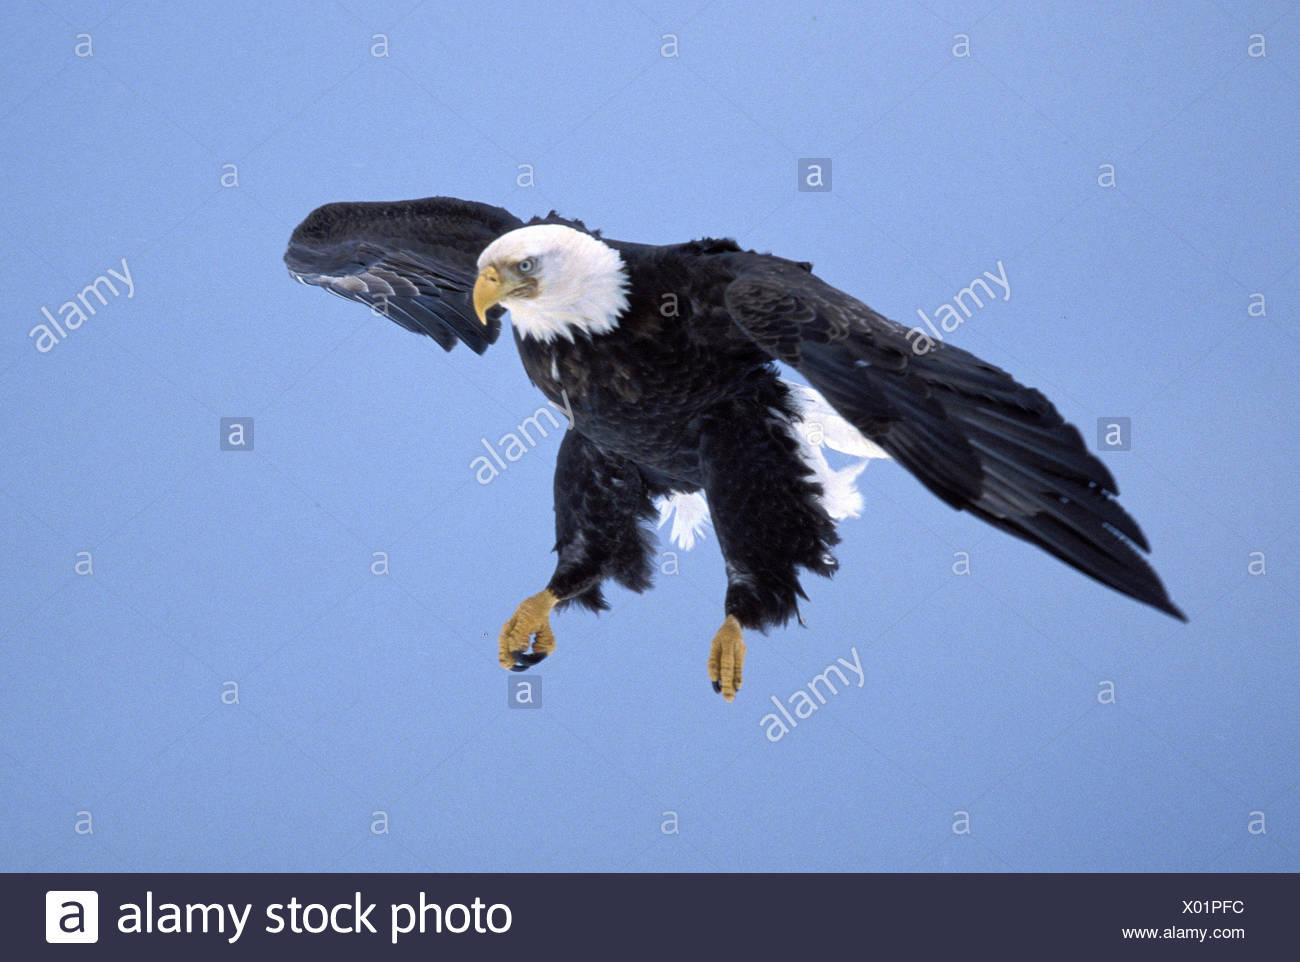 zoology / animals, avian / bird, Accipitridae, Bald Eagle (Haliaeetus leucocephalus), flying, Homer, Alaska, USA, distribution: North America, Additional-Rights-Clearance-Info-Not-Available - Stock Image